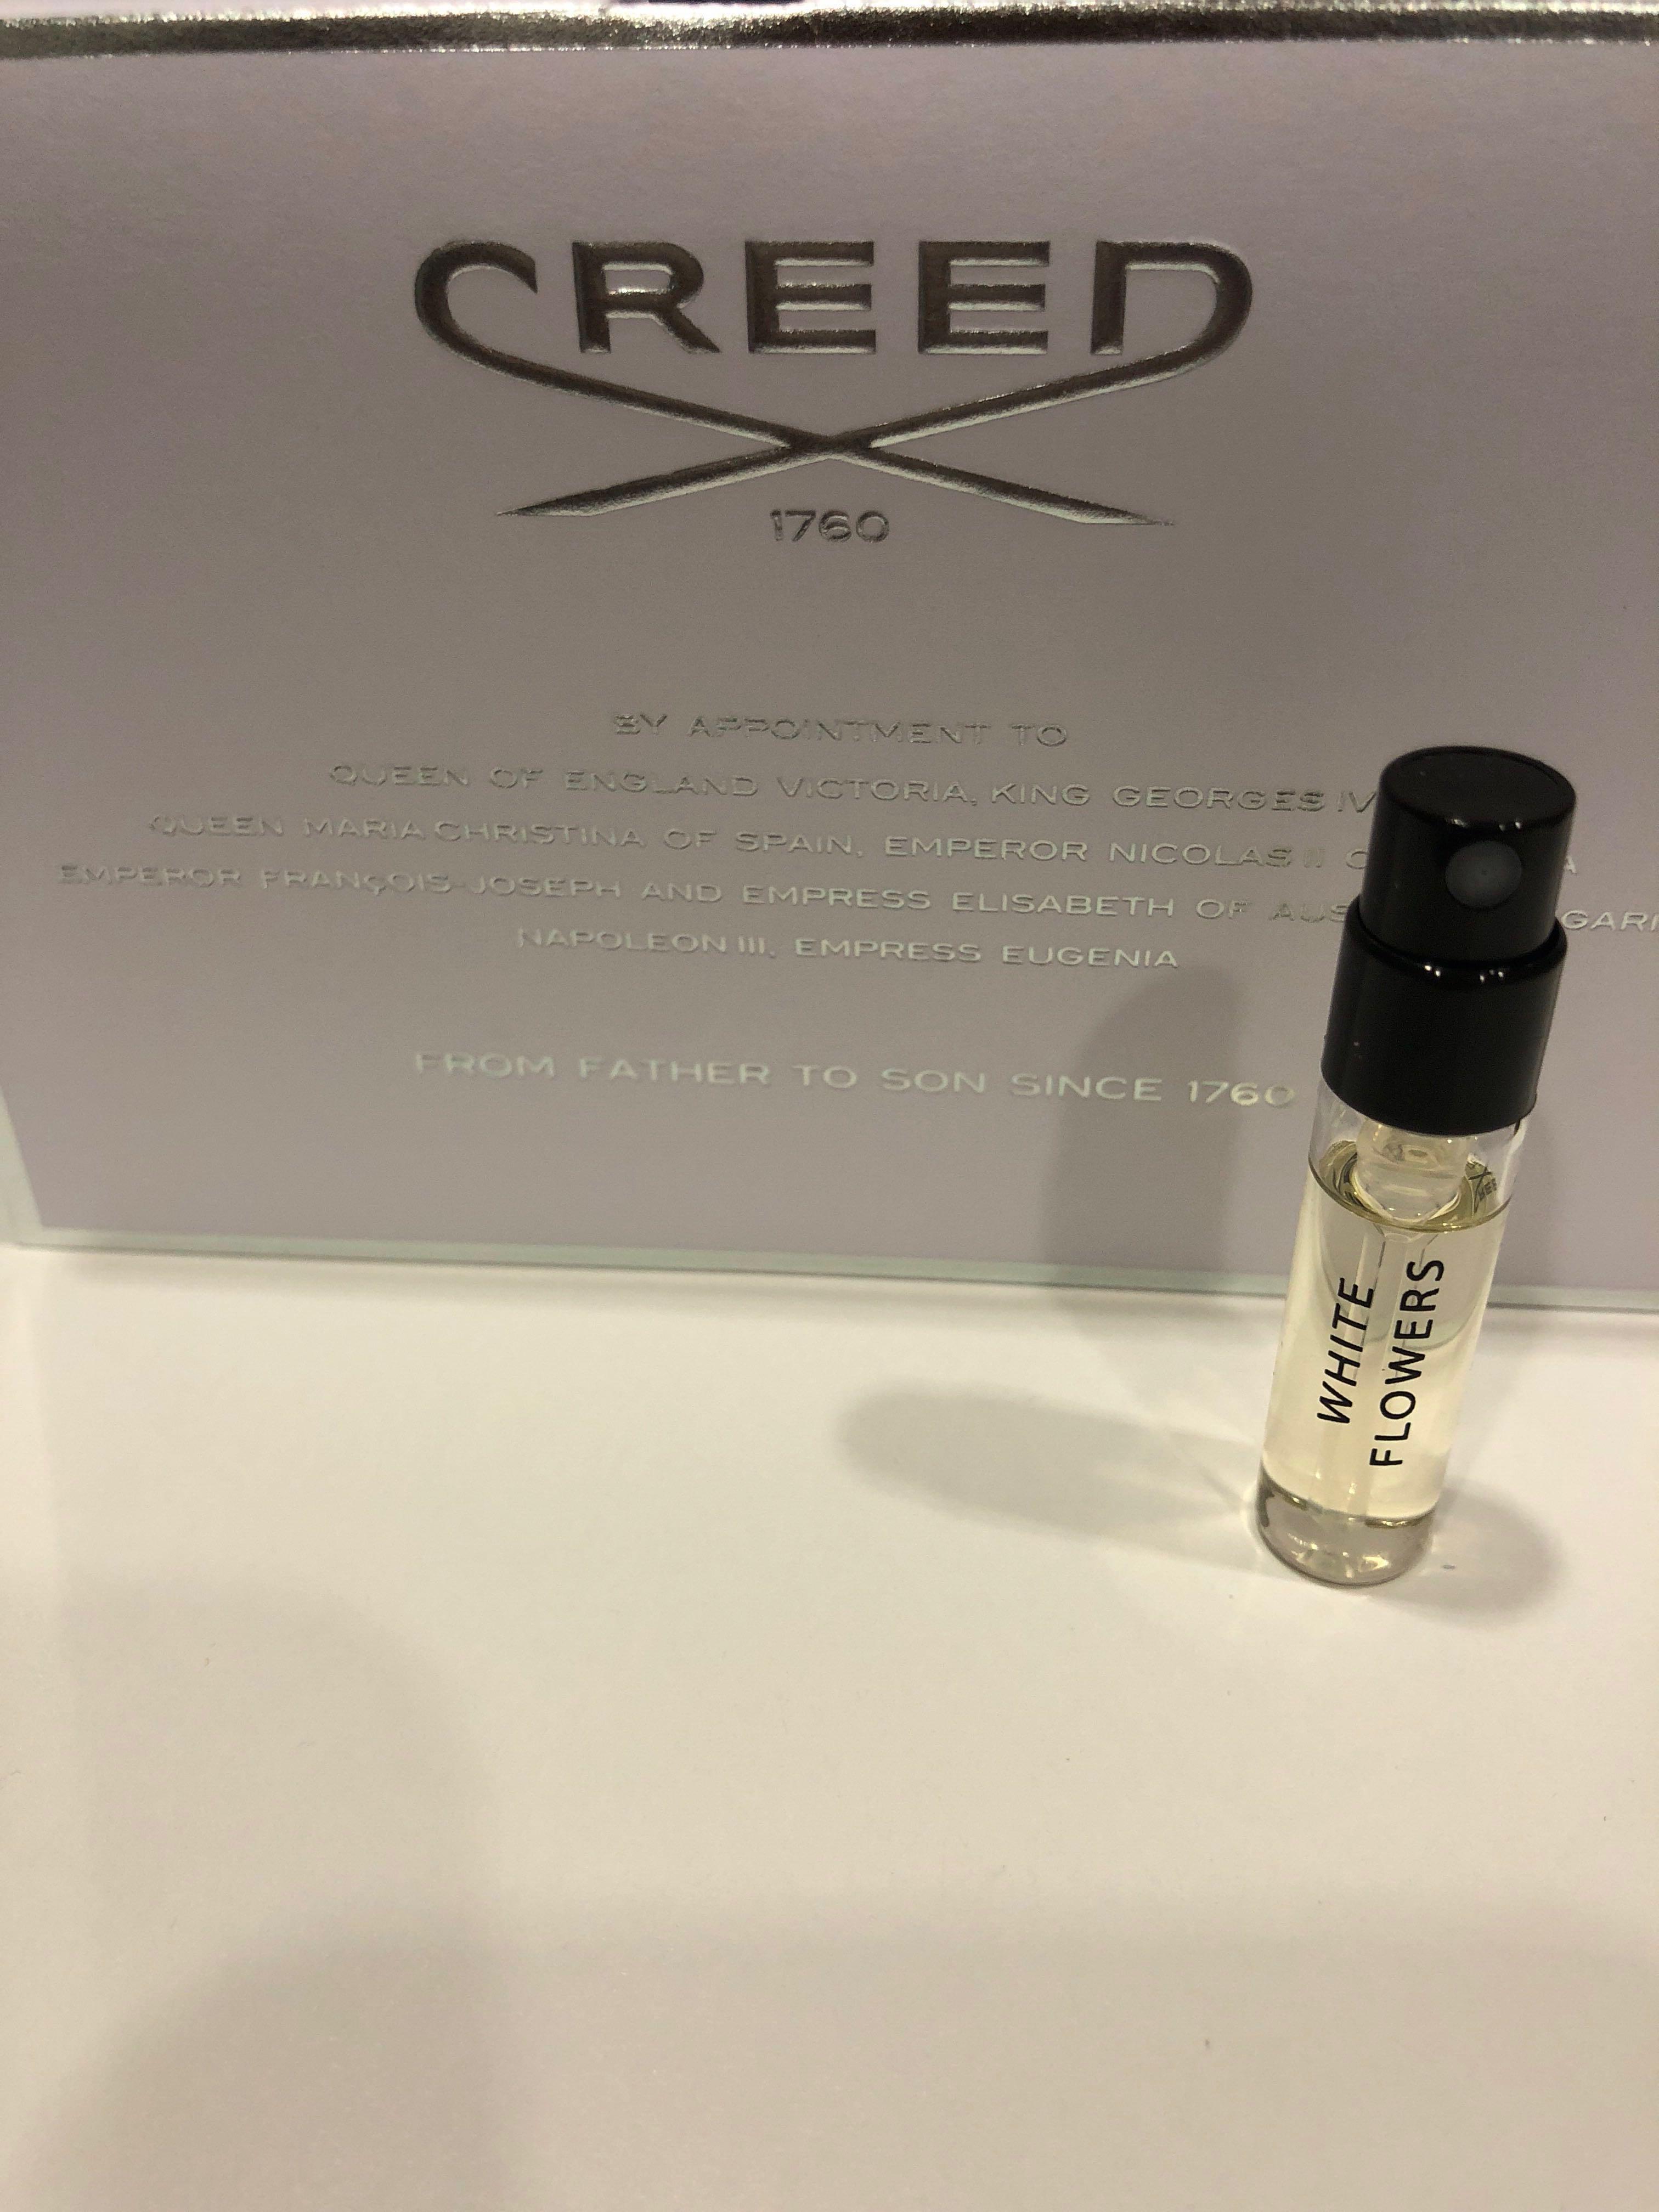 Creed 1760 Echantillon Perfume White Flowers Health Beauty